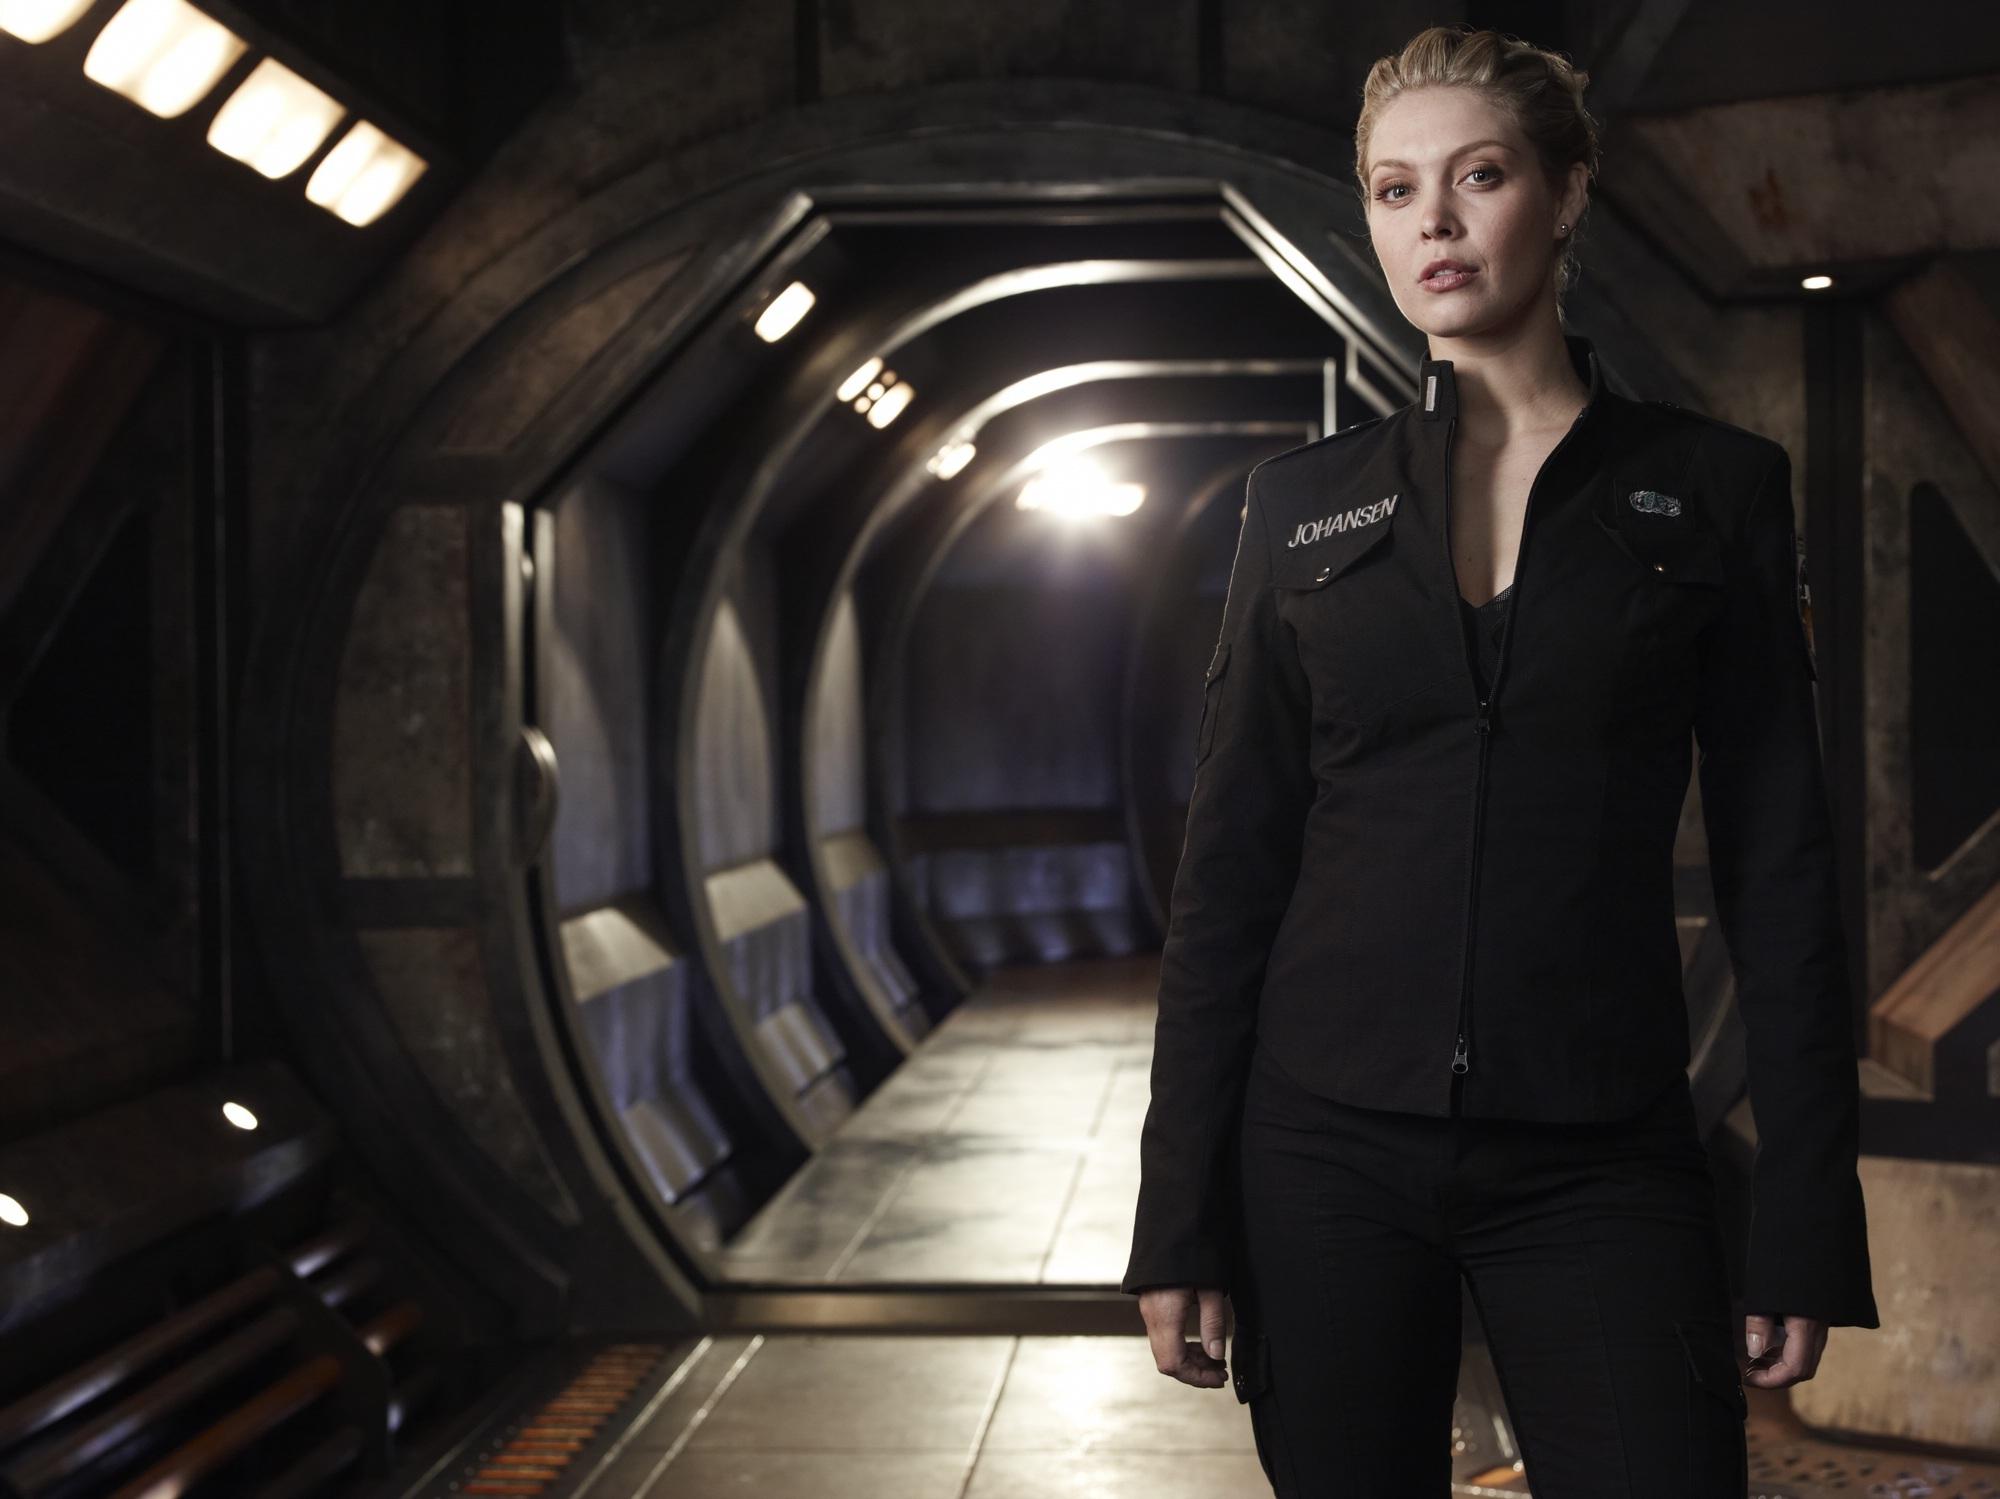 Tamara-Johansen-stargate-universe-26254372-2000-1499